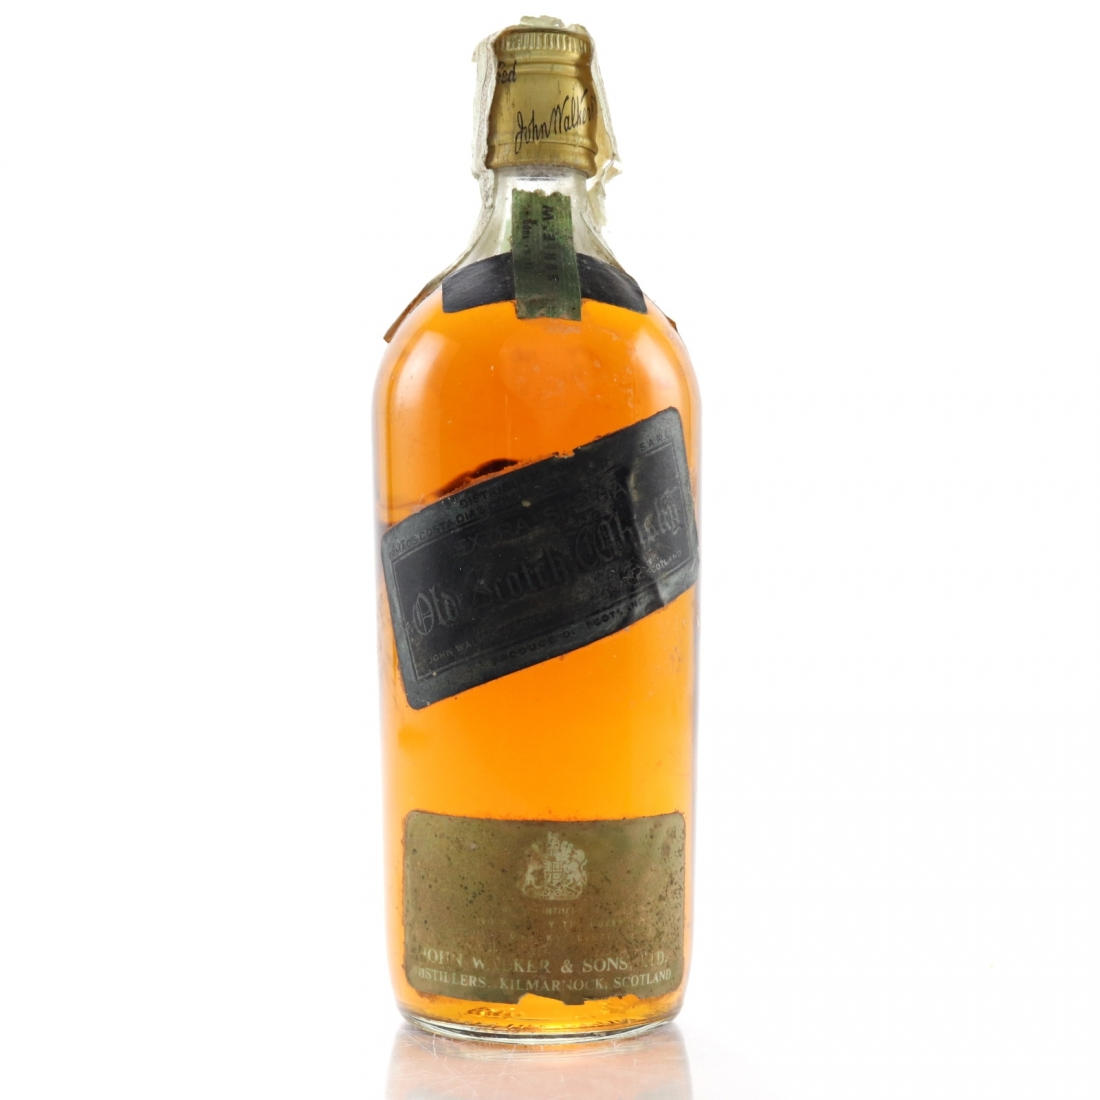 Johnnie Walker Black Label 1960s / Portuguese Import